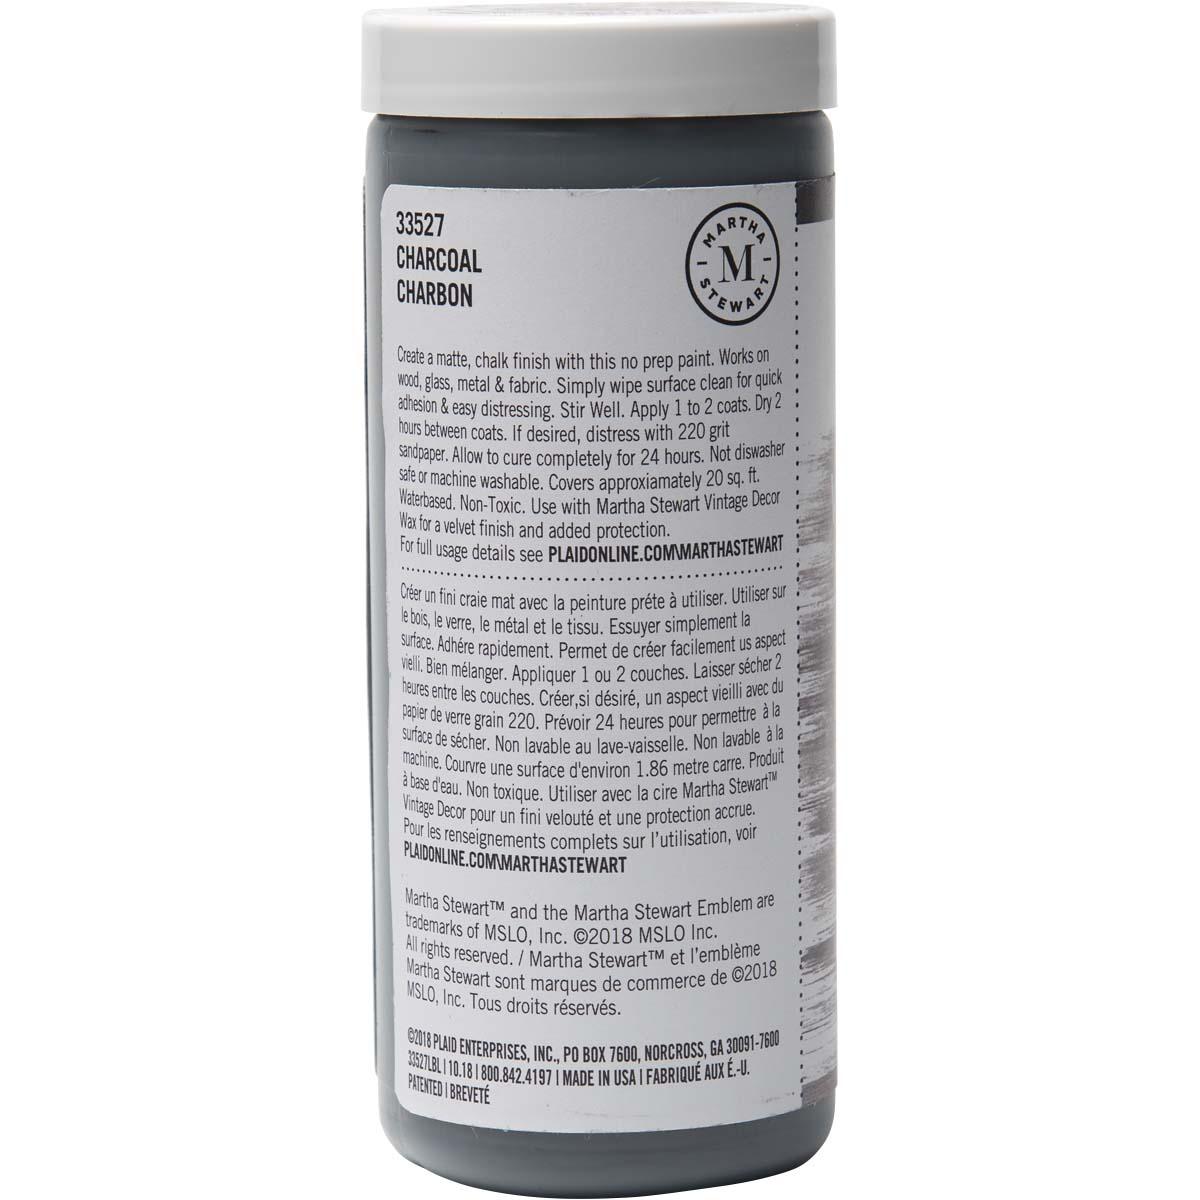 Martha Stewart ® Vintage Decor Matte Chalk Acrylic Paint - Charcoal, 8 oz. - 33527